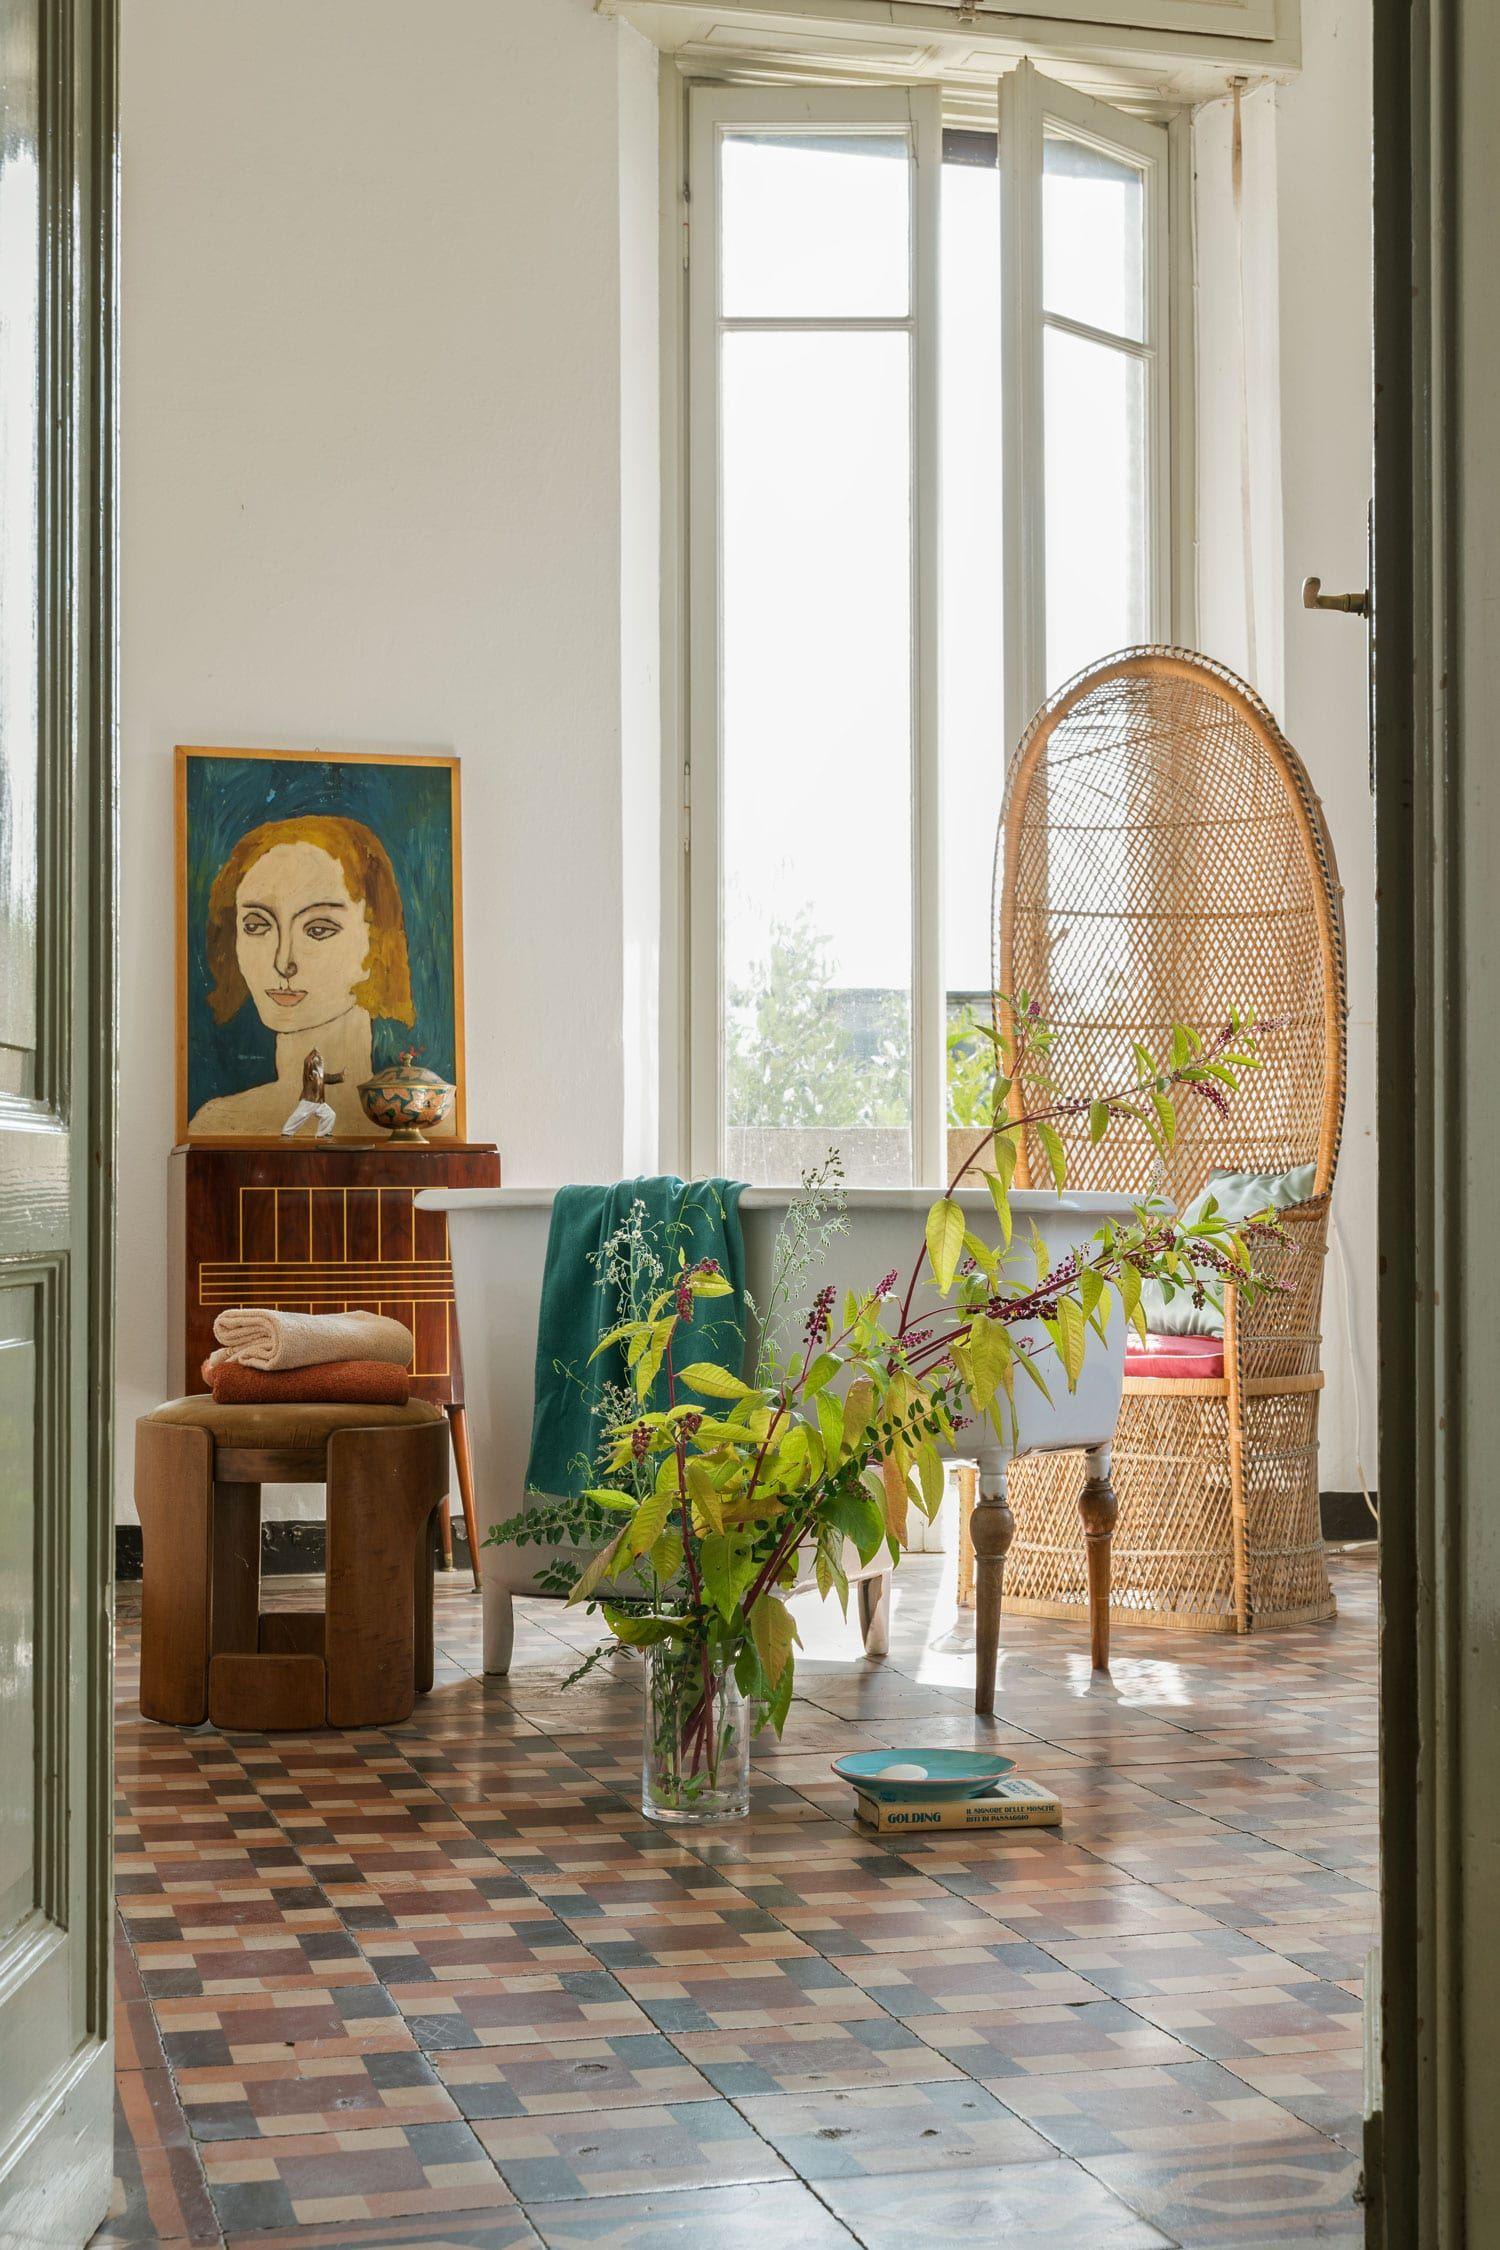 Pin By Pipi Pi On Livingroom Interior Vignette Interior Design Design